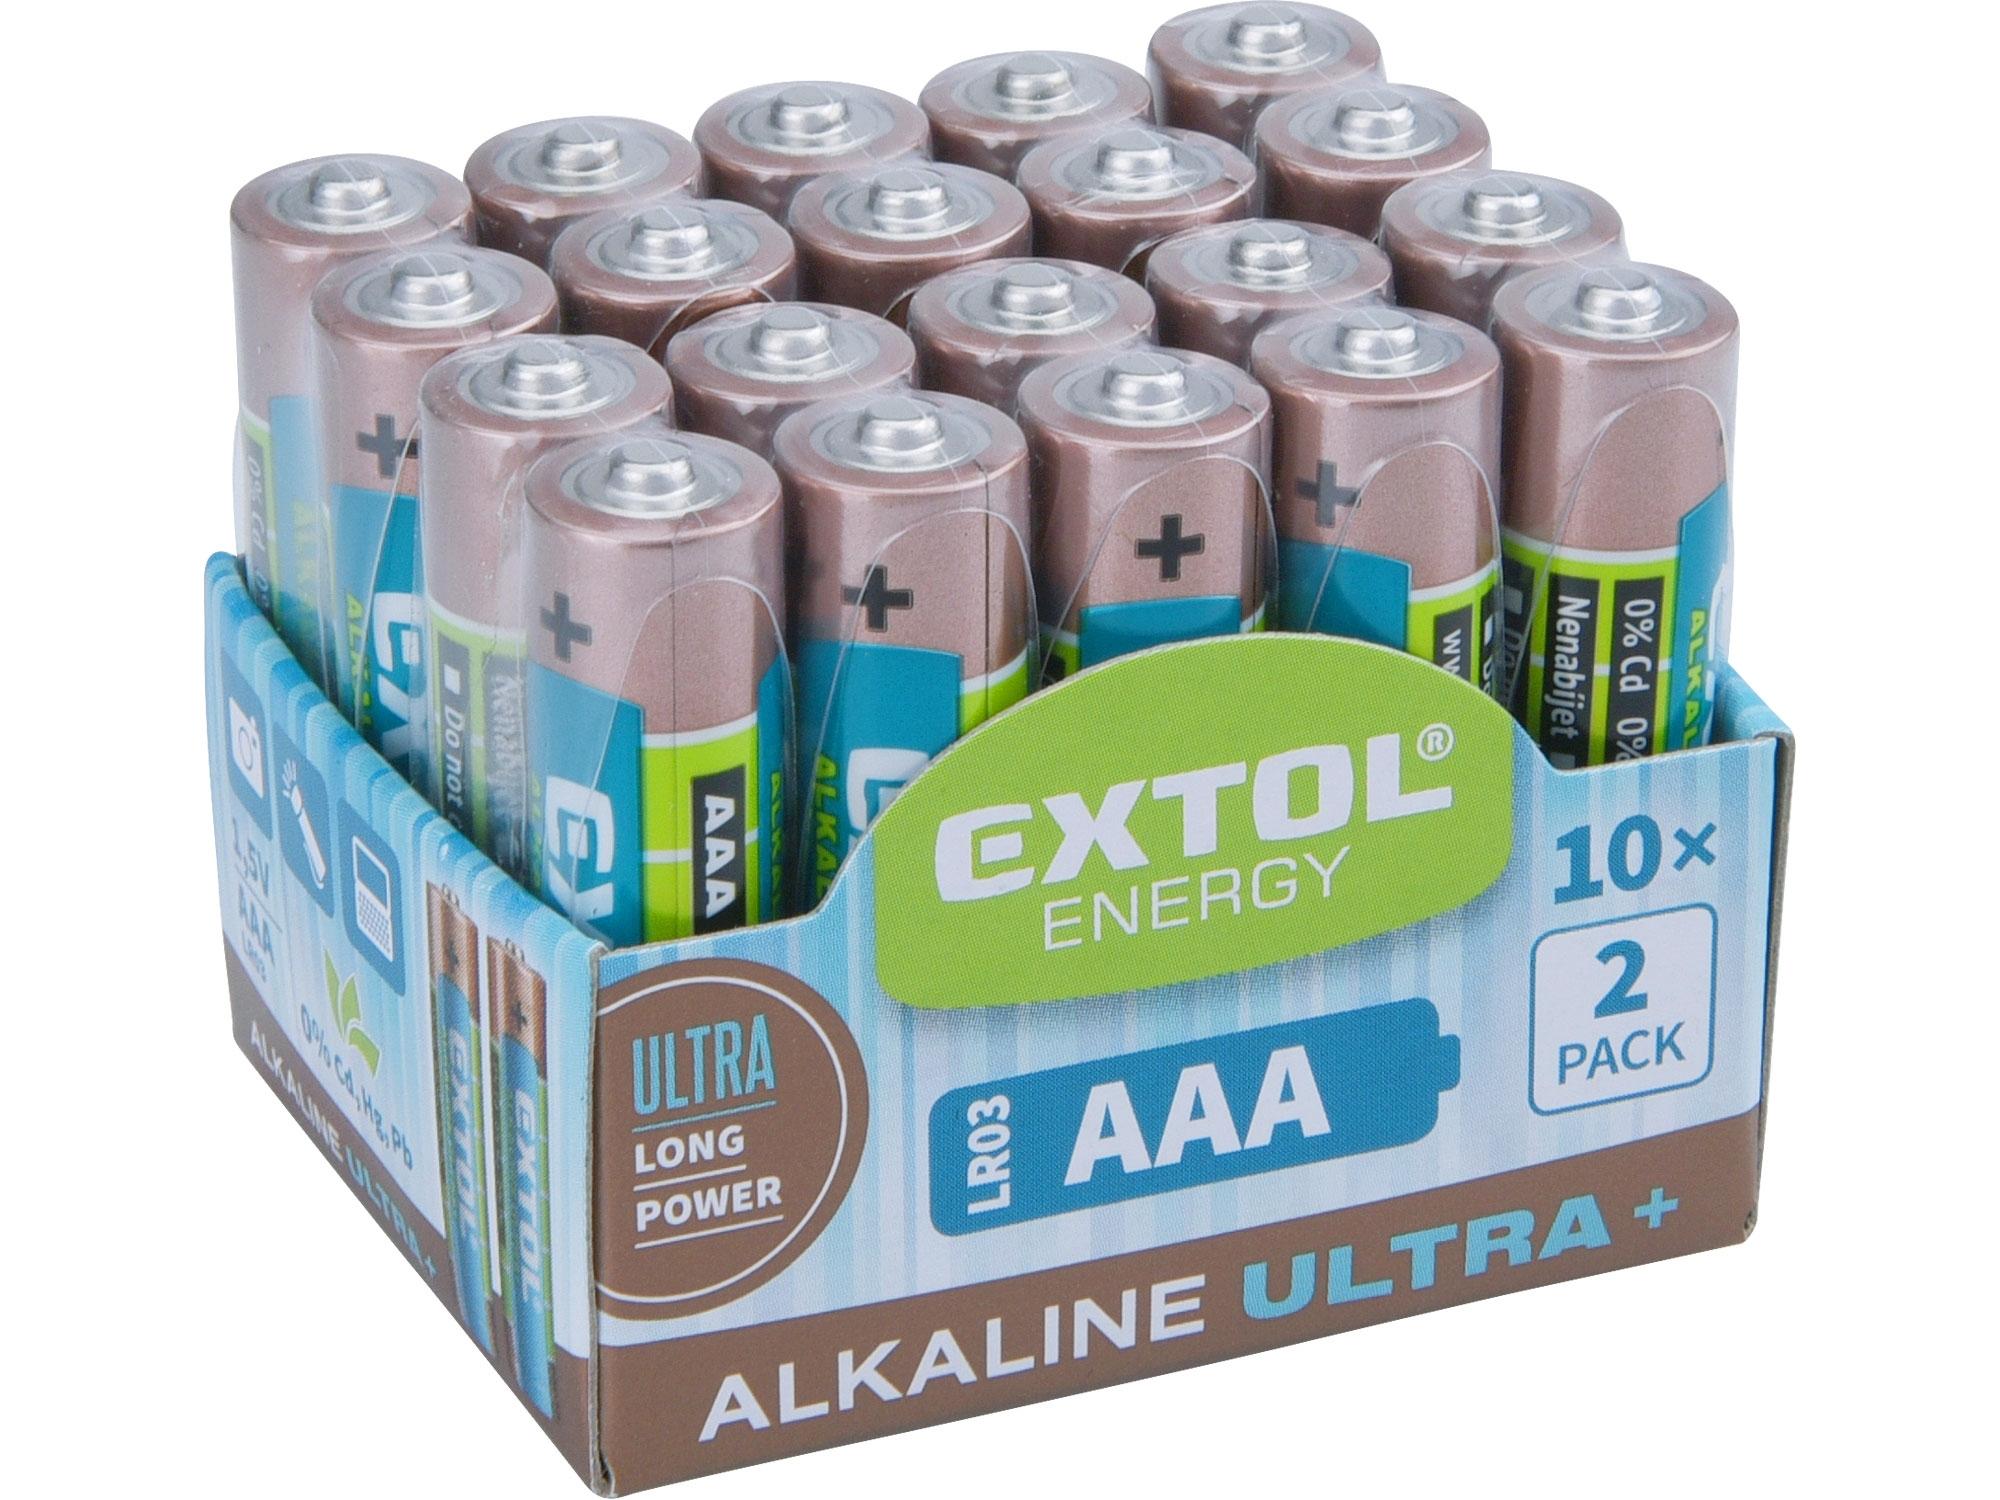 baterie alkalické, 20ks, 1,5V AAA (LR03), EXTOL ENERGY 42012